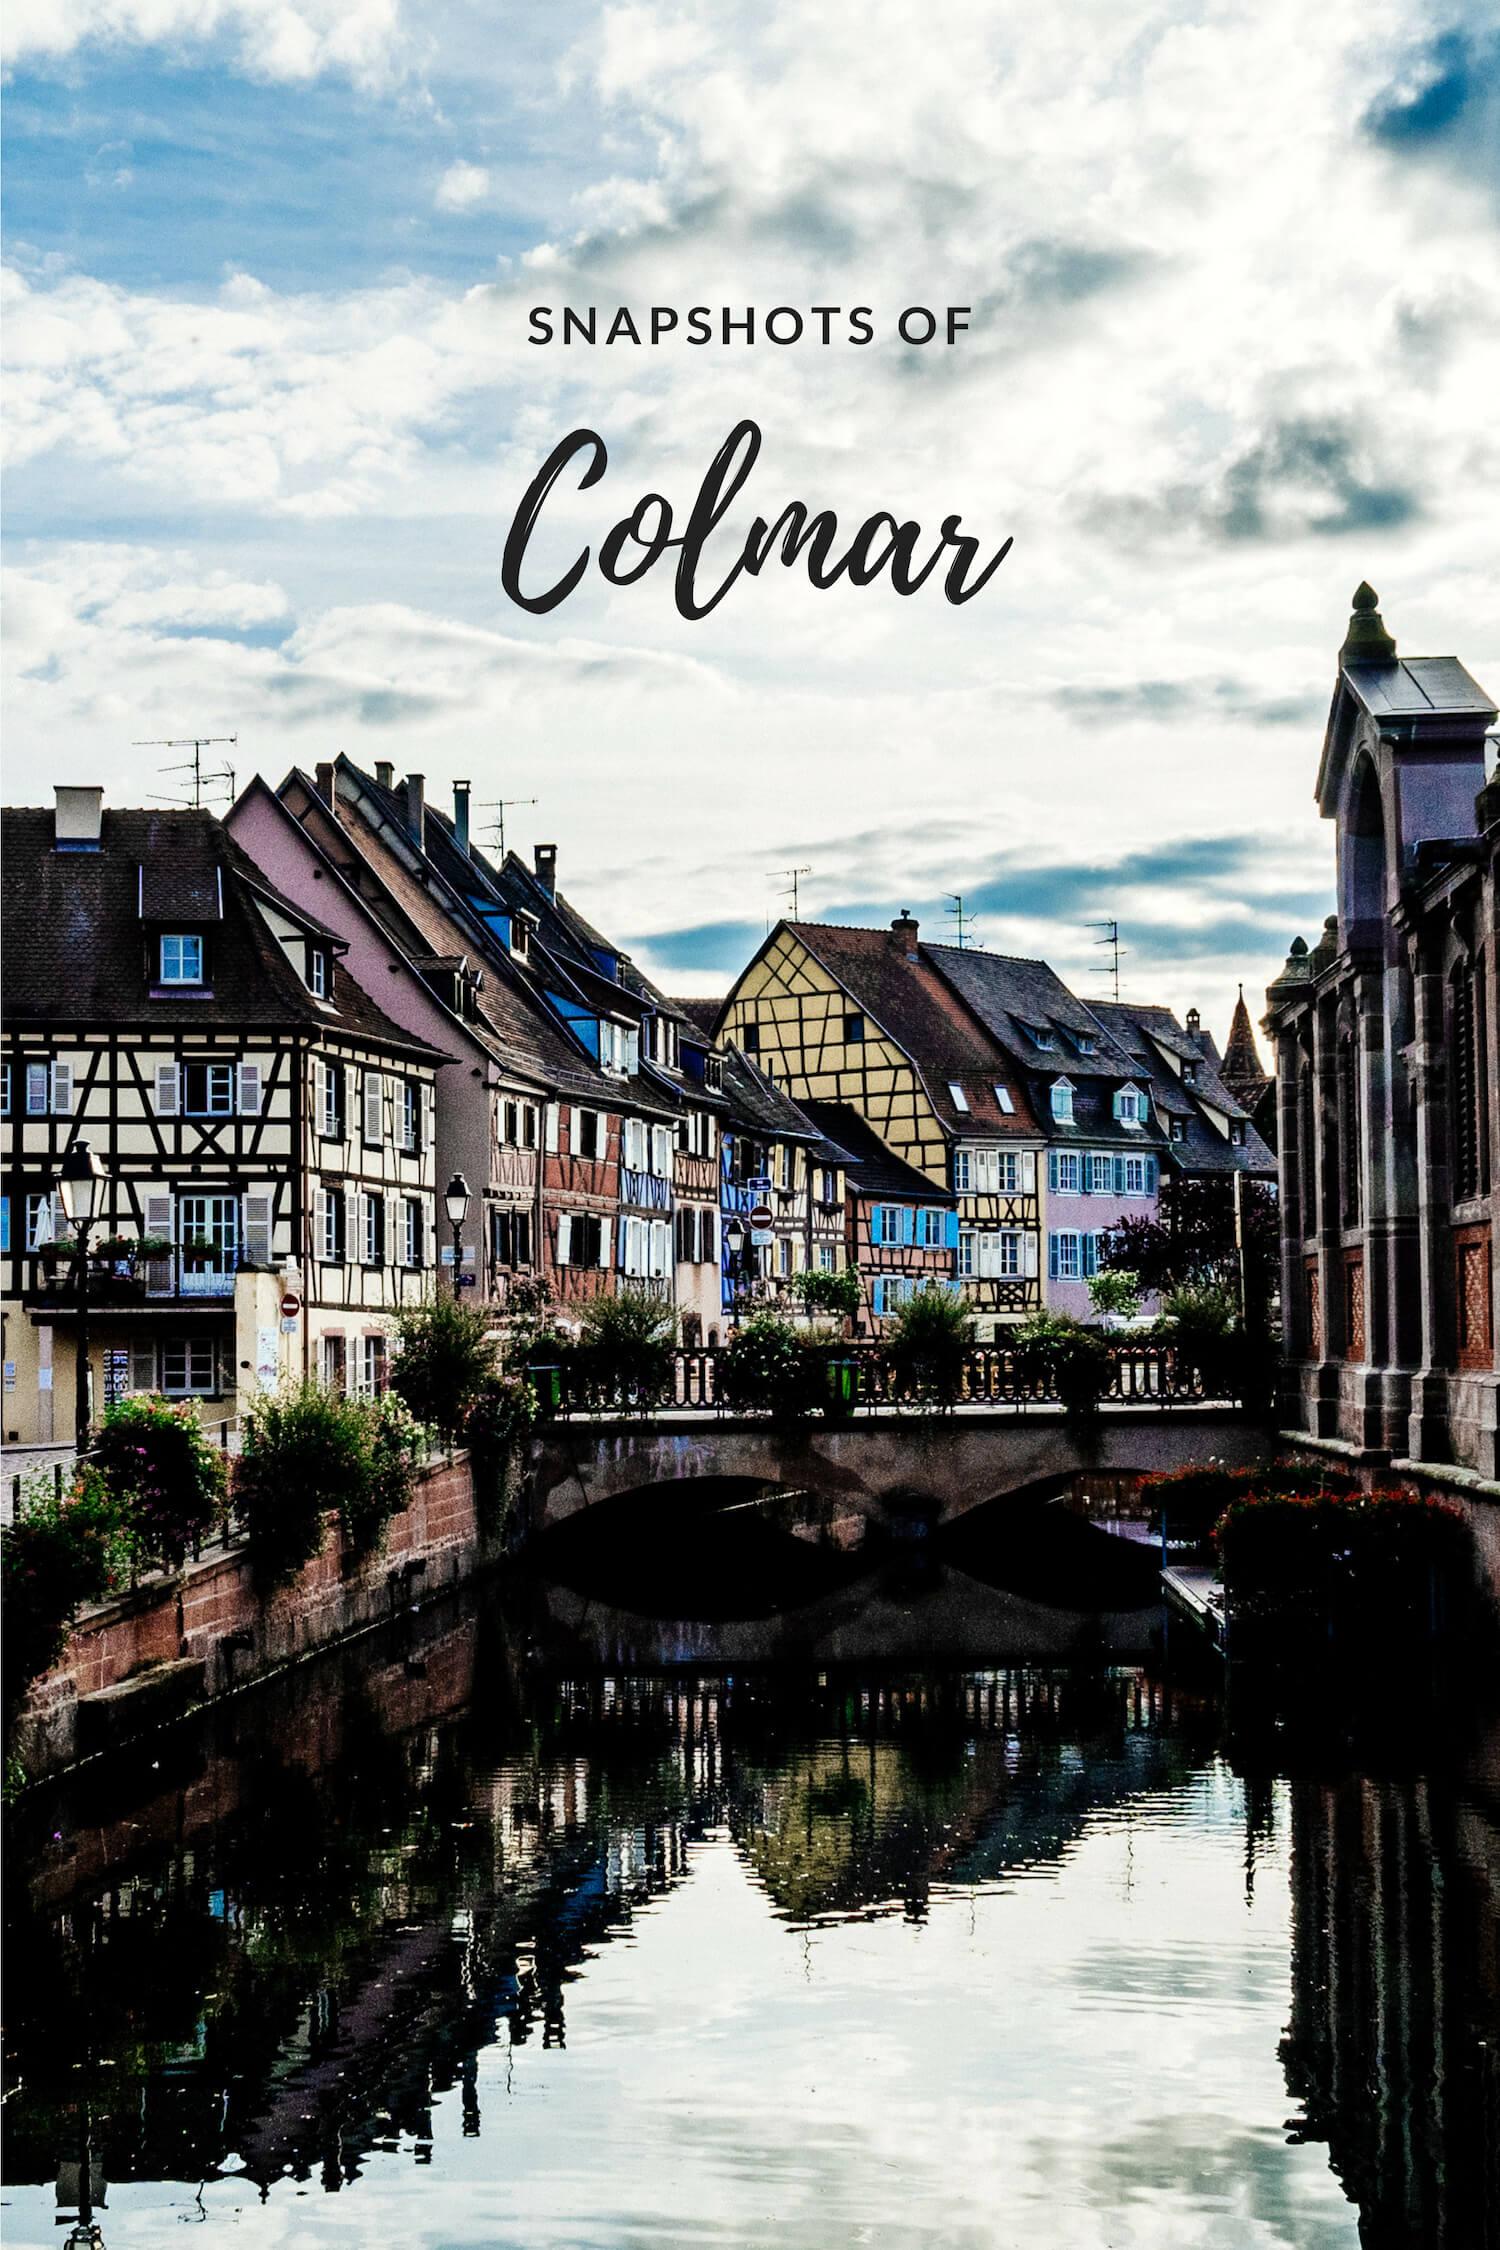 Snapshots of Colmar France